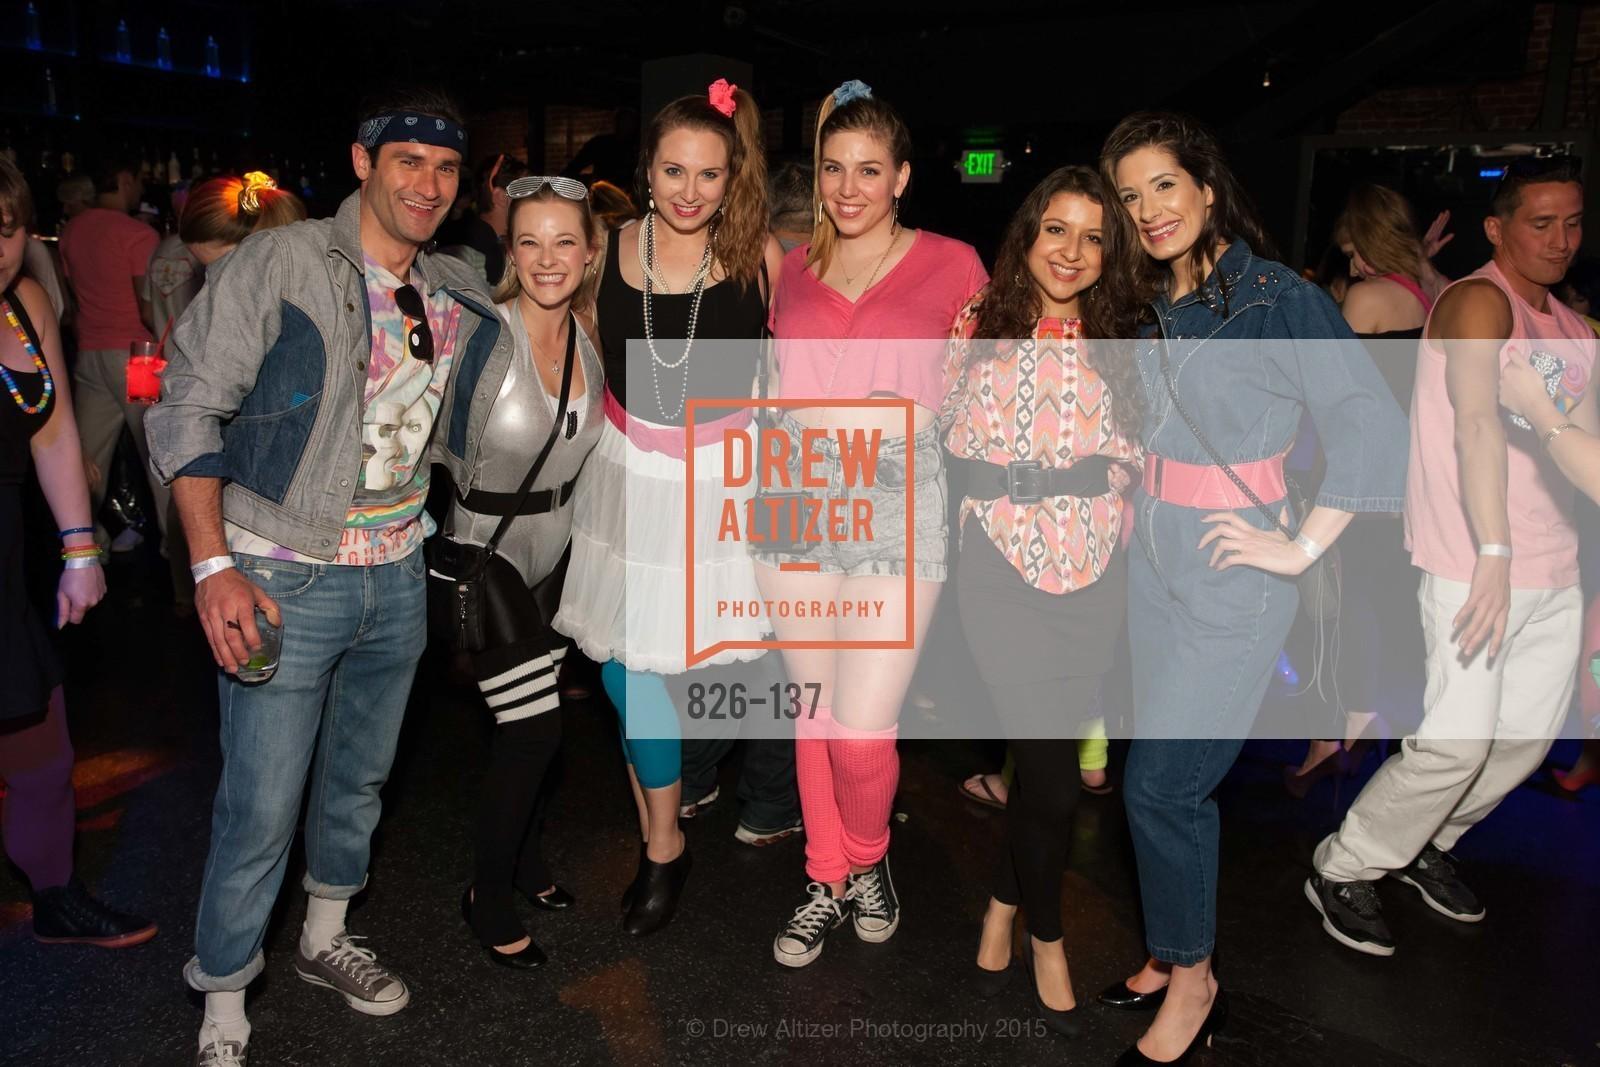 Natalie Perry, Alyssa Nordtsrom, Marissa Corona, Sabrina JOhn, Spinsters of San Francisco